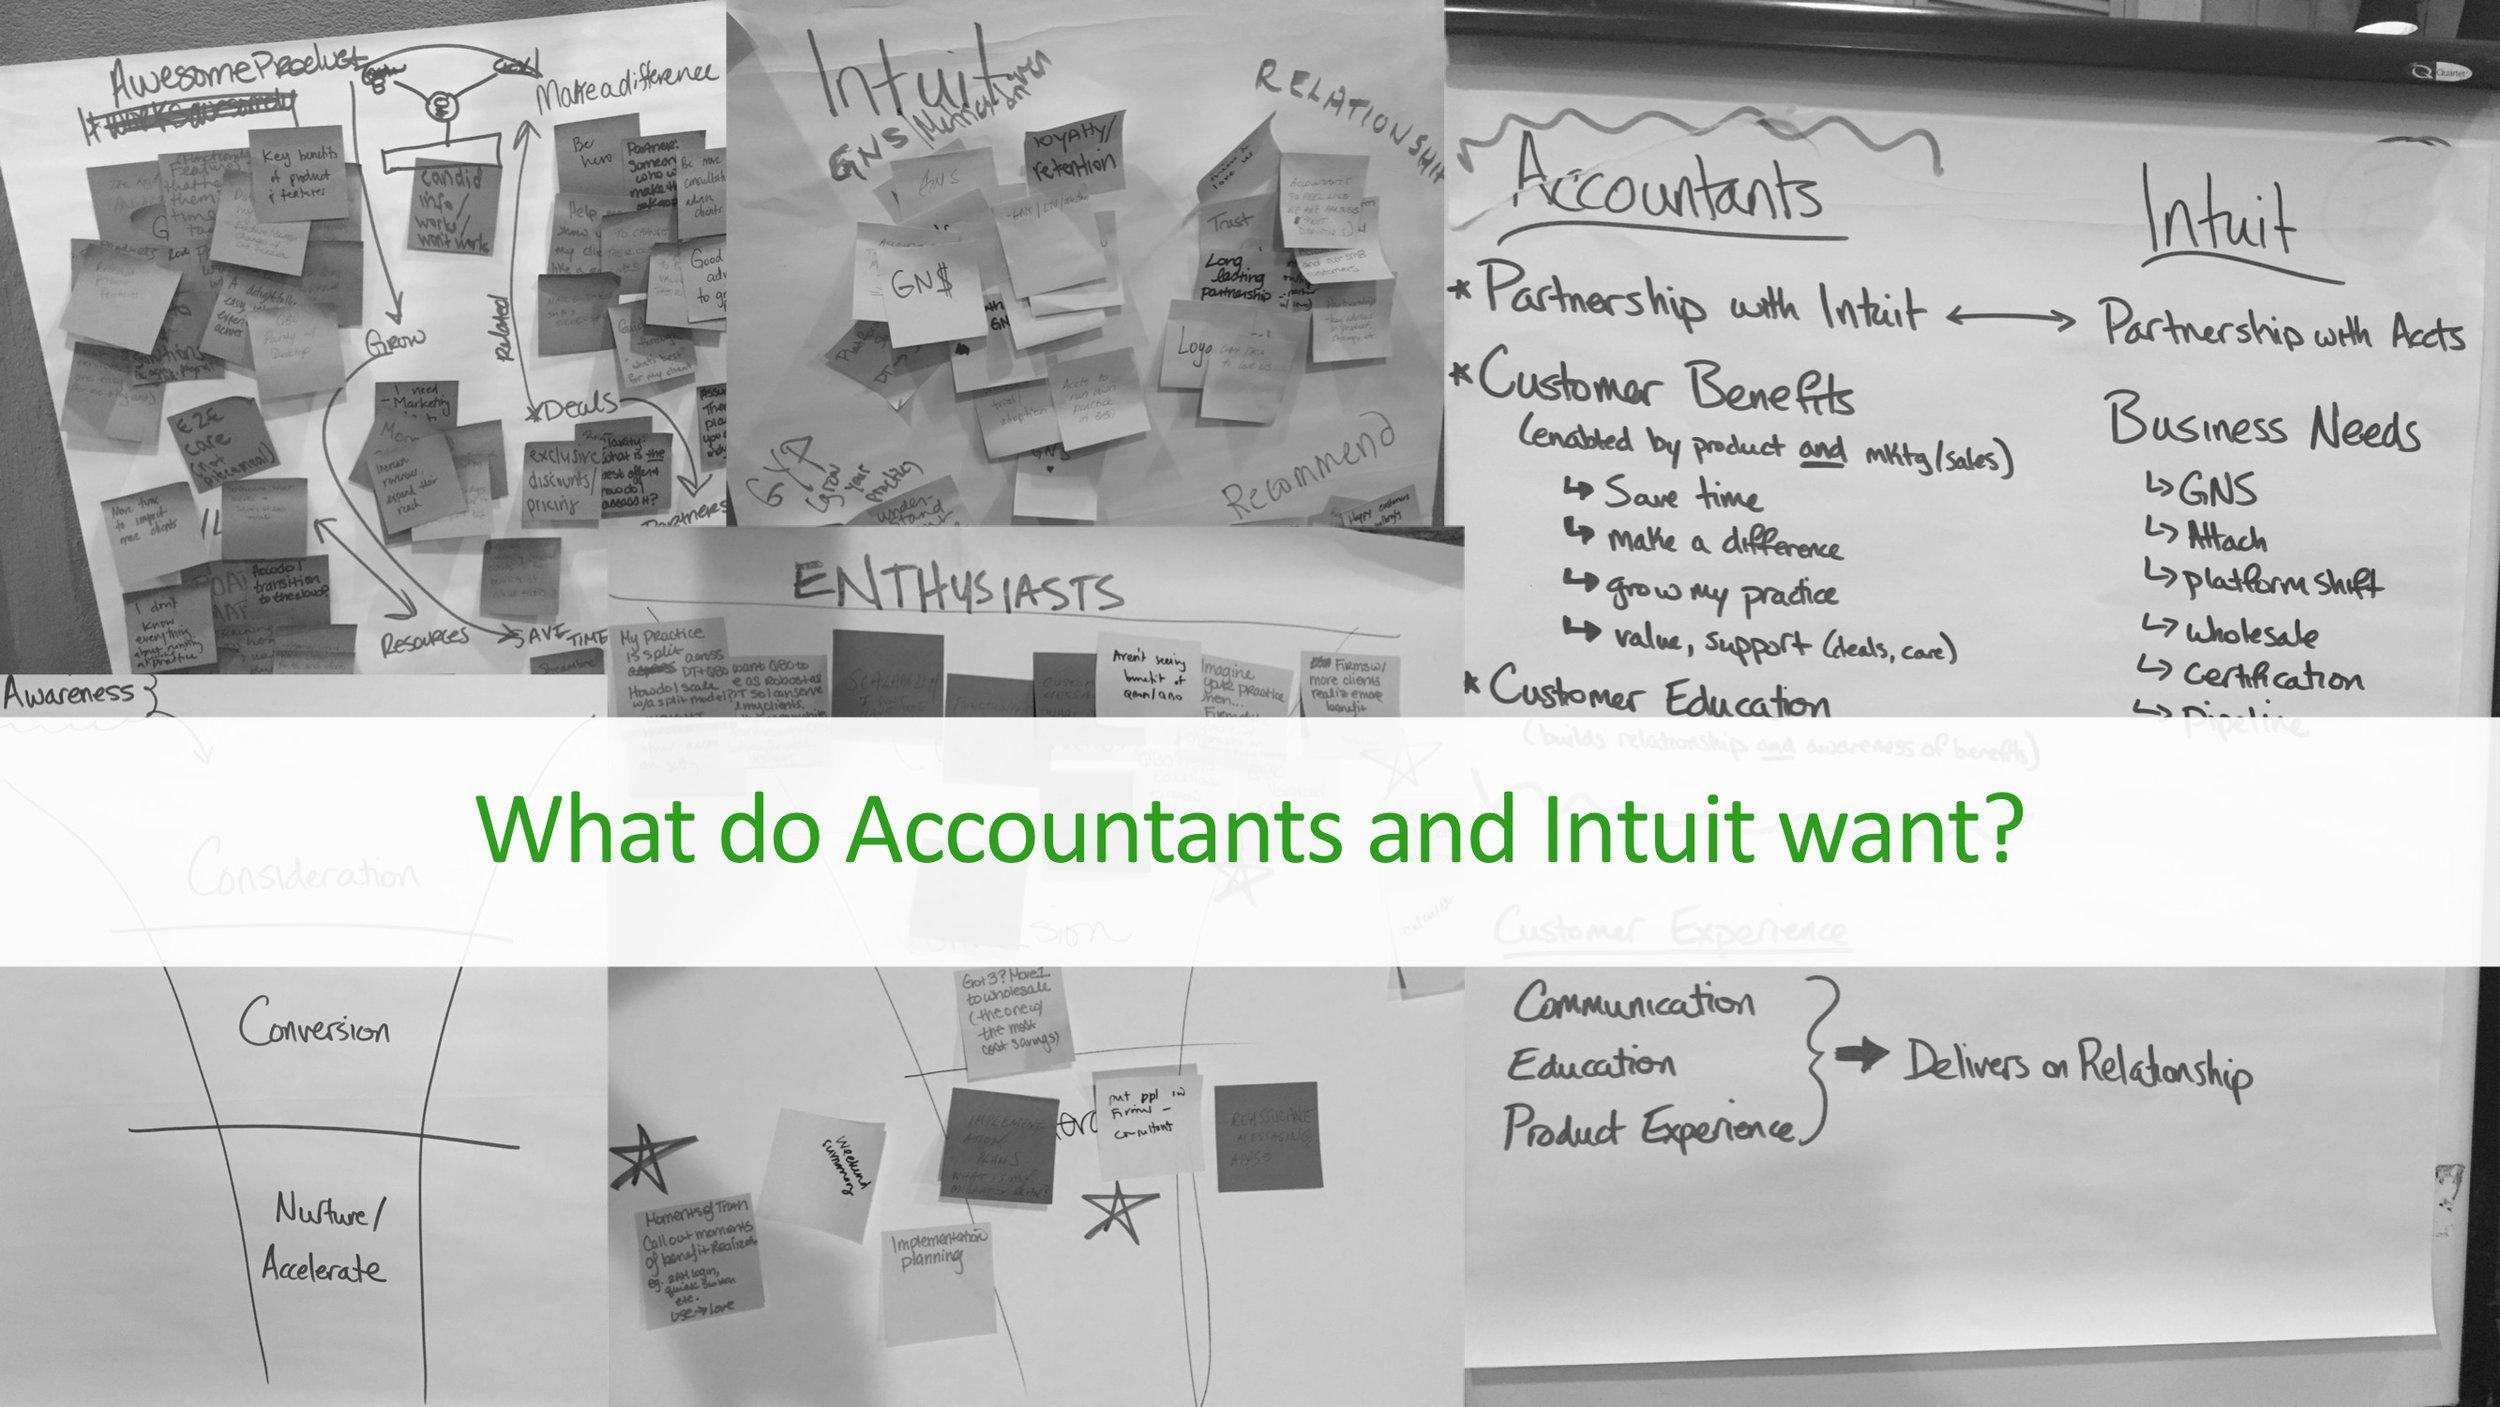 Strategy for Accountant v2.5 6.jpeg